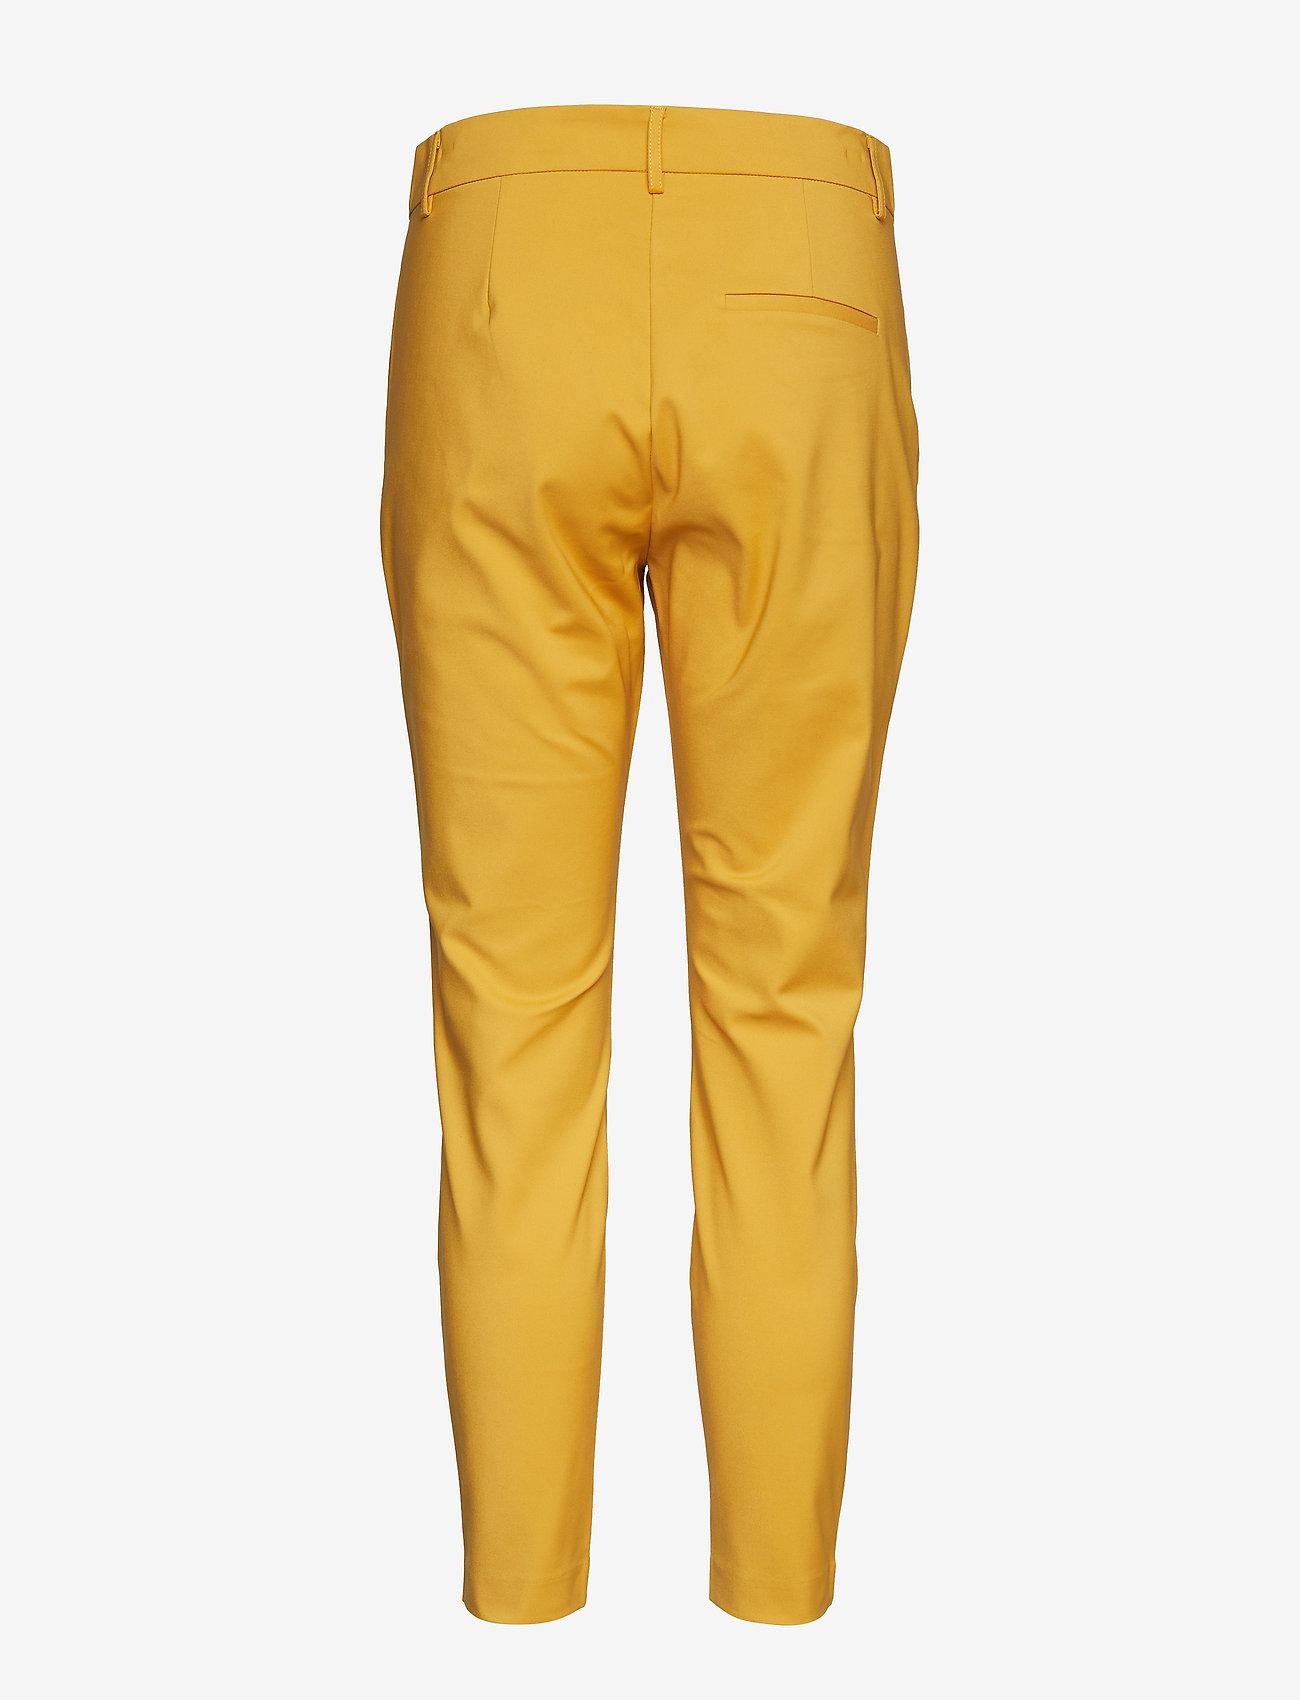 Coster Copenhagen Pants With Zipper Pockets - Julia Trousers